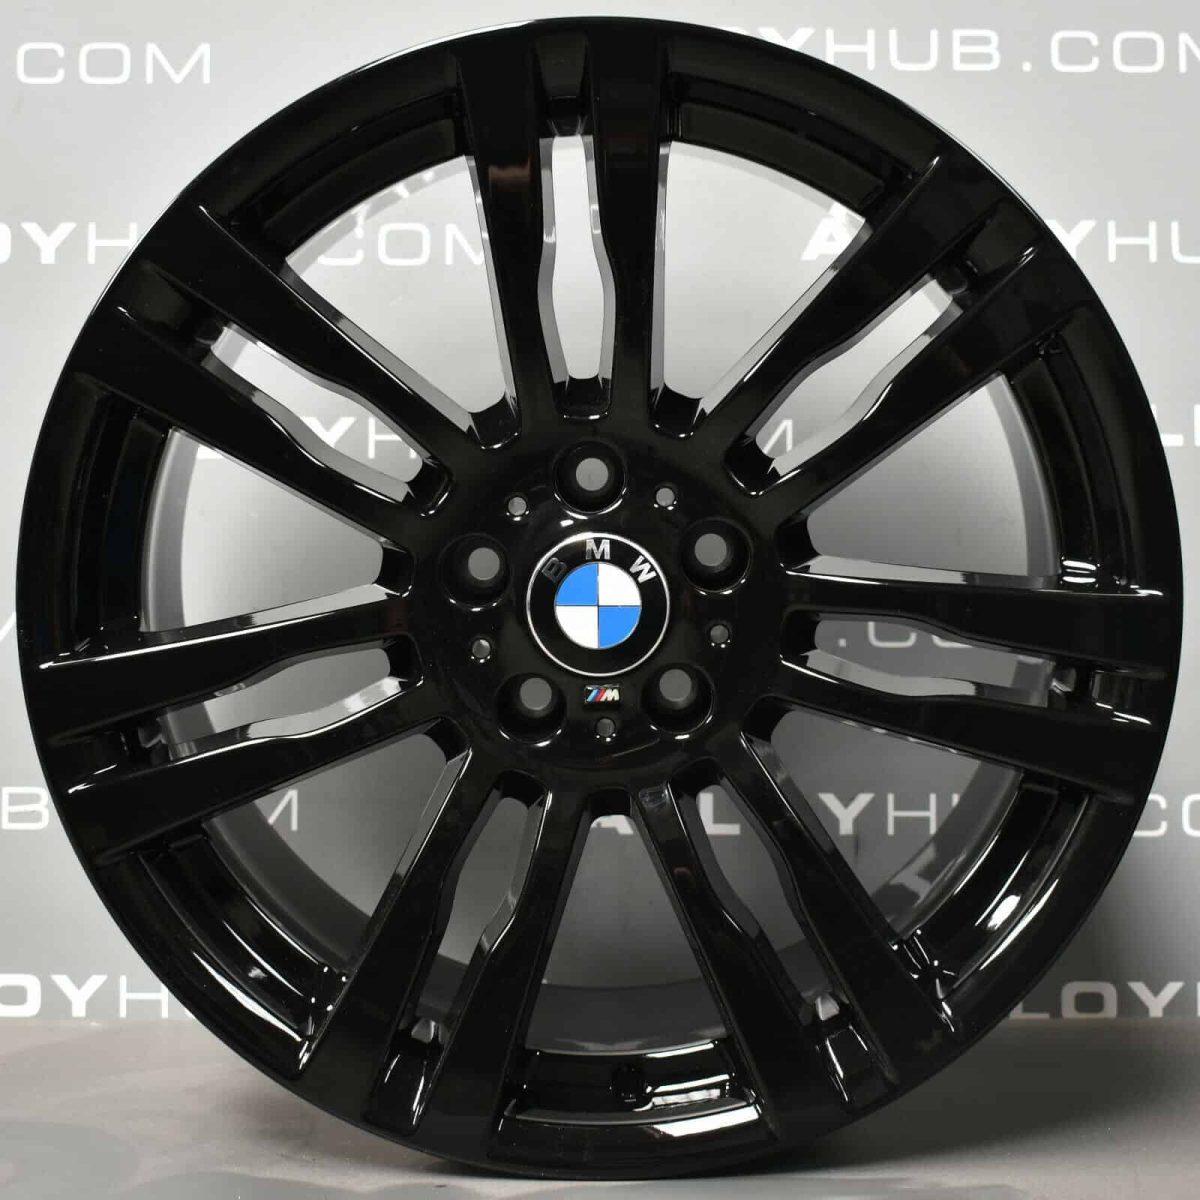 Genuine BMW X5/X6 E70 E71 E72 Style 333M Sport 20″ Inch 7 Twin Spoke Alloy Wheels with Gloss Black Finish 36117842183 36117842184